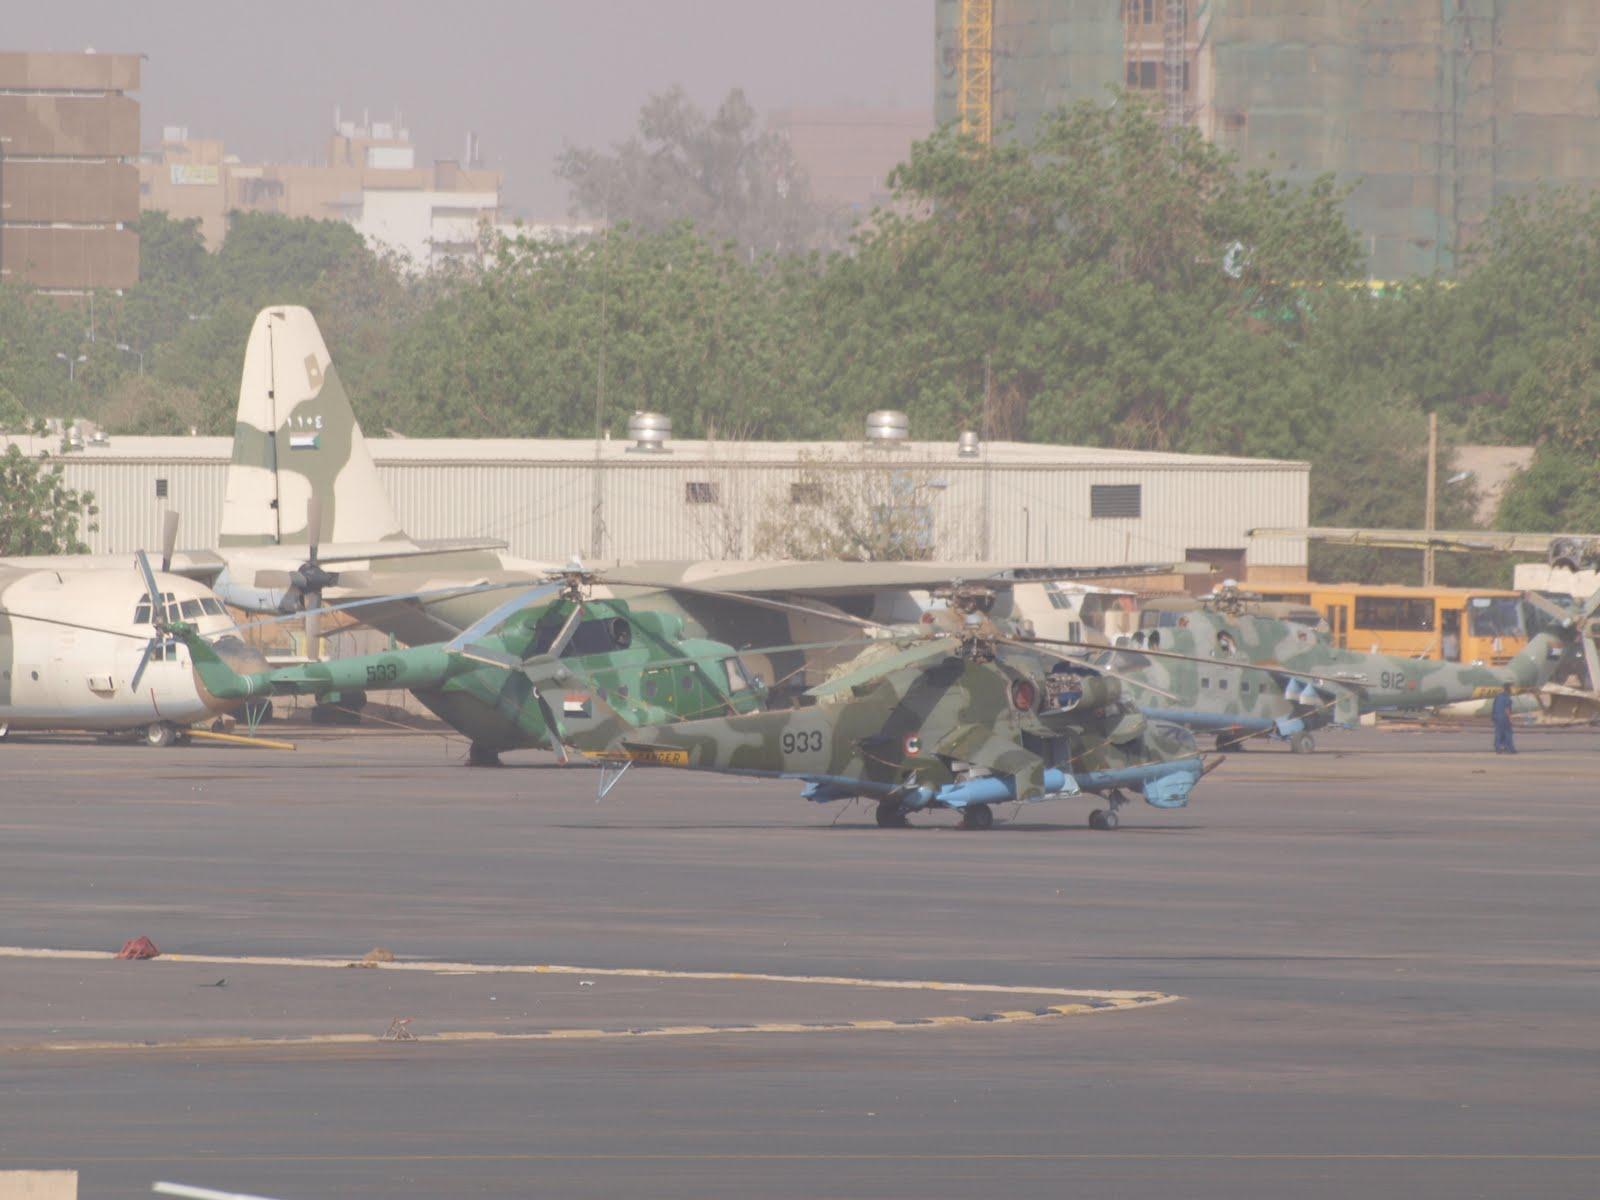 Armée Soudanaise / Sudanese Armed Forces ( SAF ) JARTUM+SUDAN+31-03-2010+MI-17+533+Y+MI-24+933